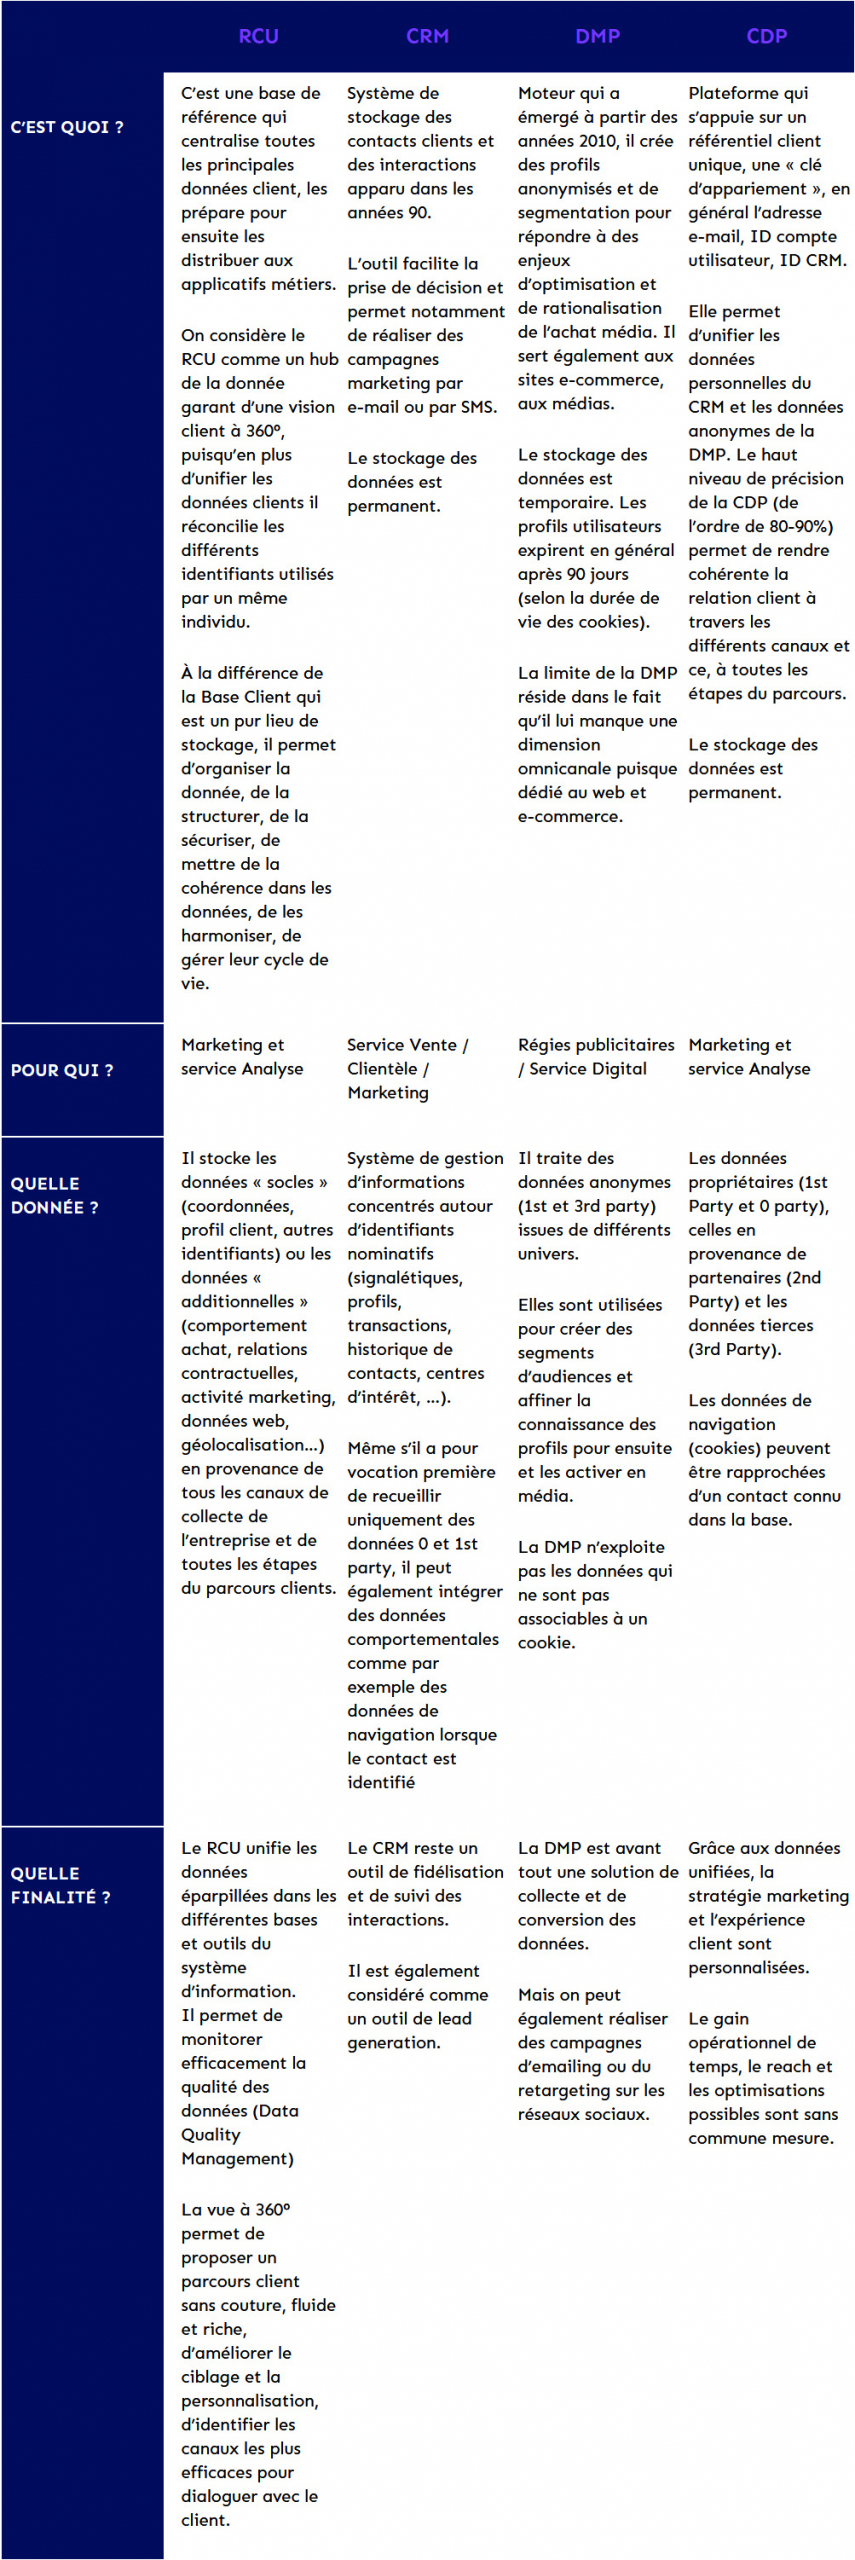 CRM, RCU, DMP et… CDP